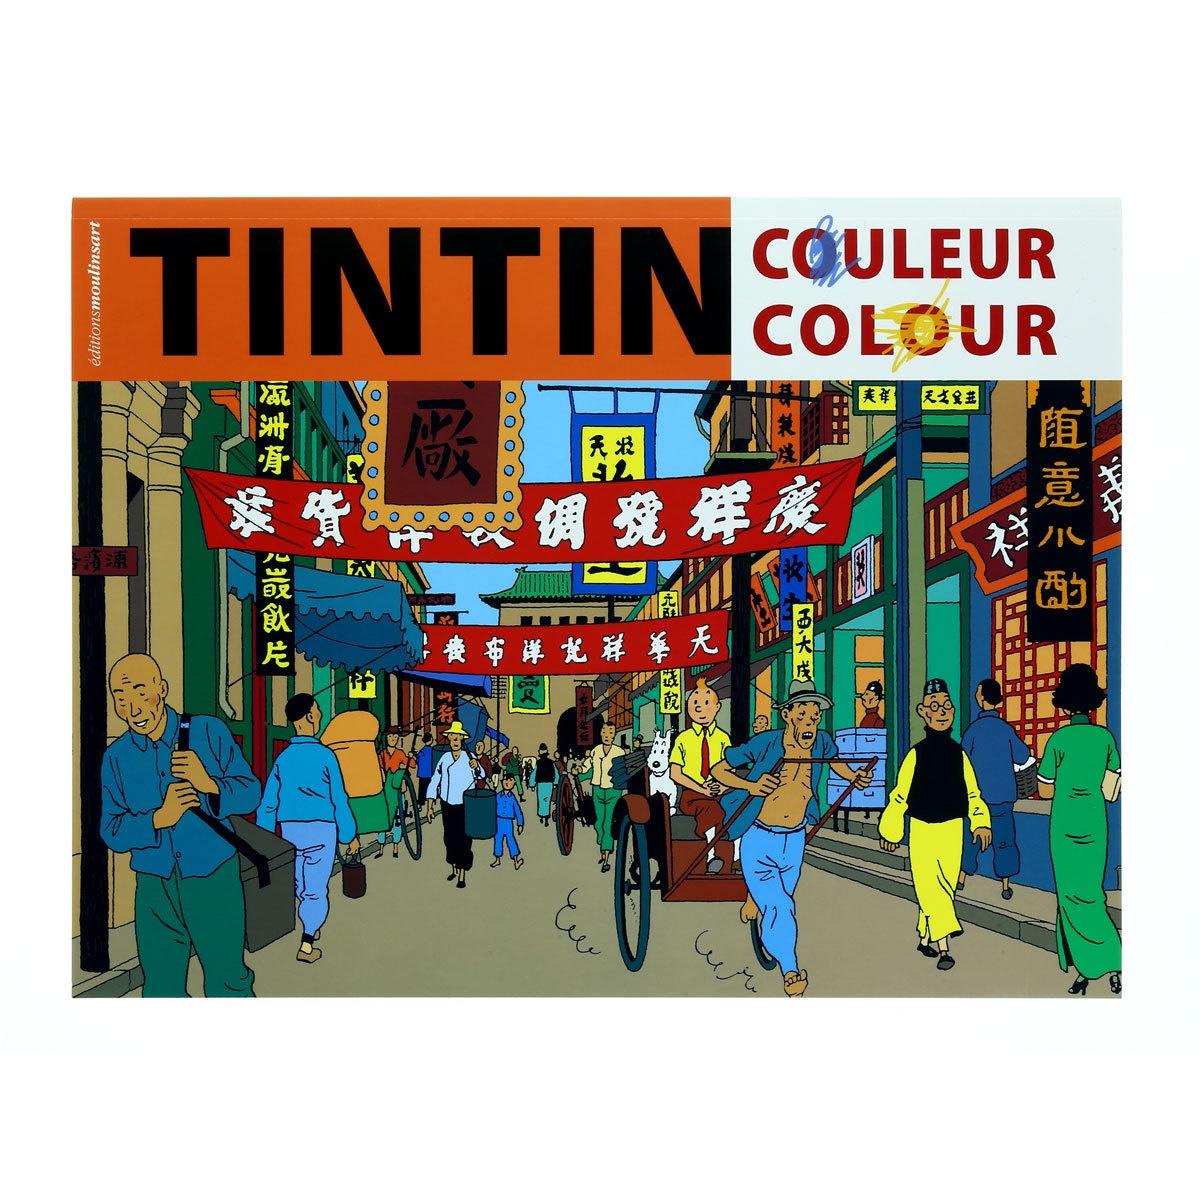 Tintin Colouring Book Orange